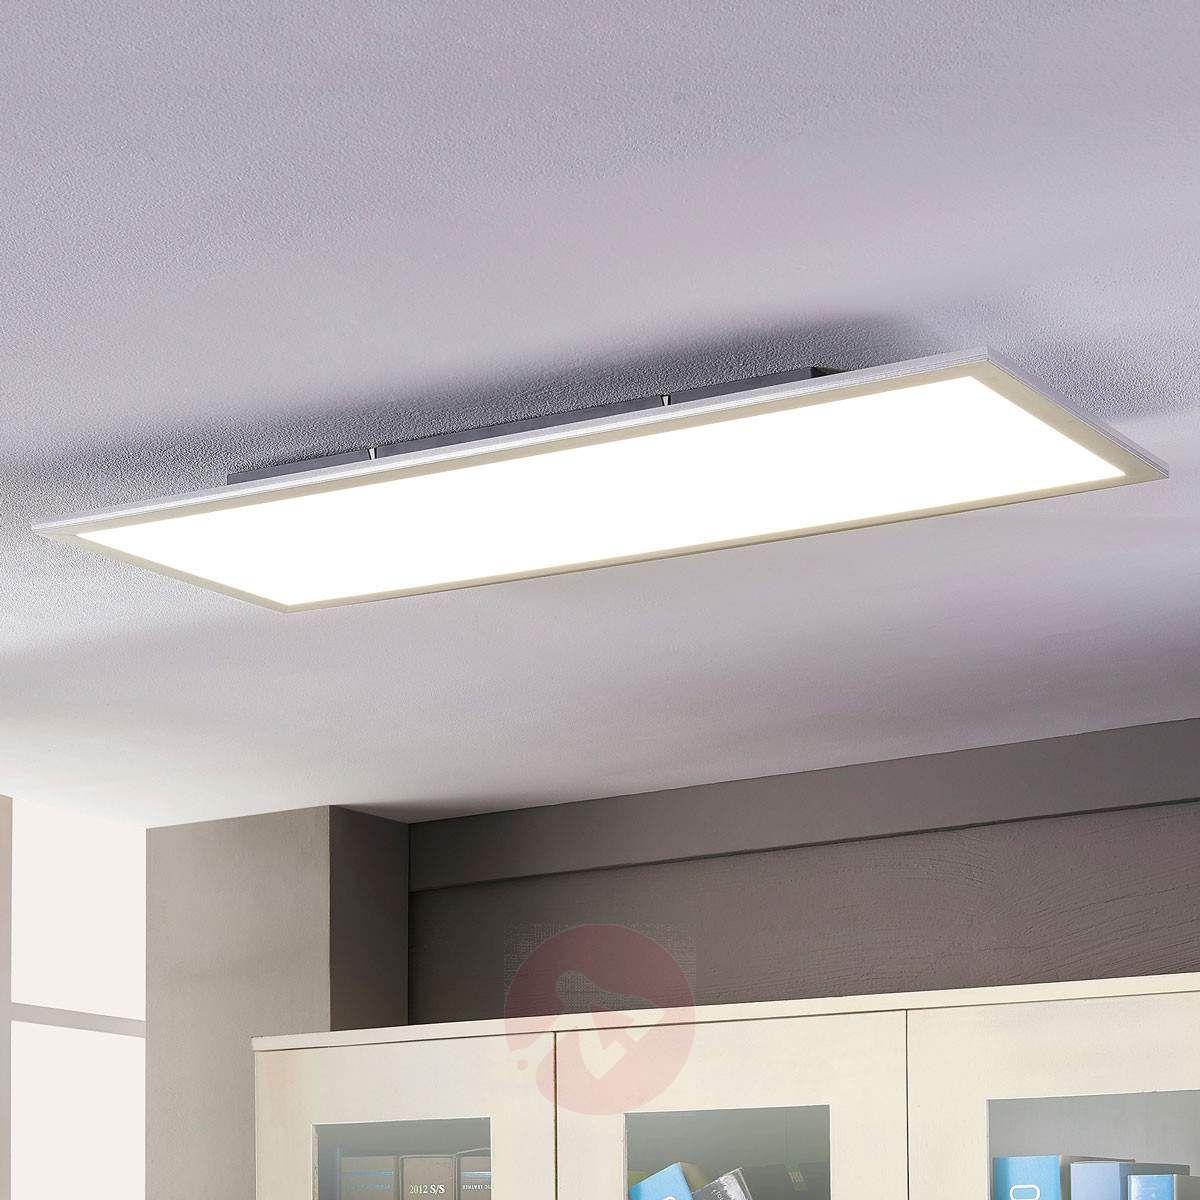 Lindby Livel Led Panel 4 000 K 120 Cm X 30 Cm Kitchen Ceiling Lights Ceiling Lights Led Panel